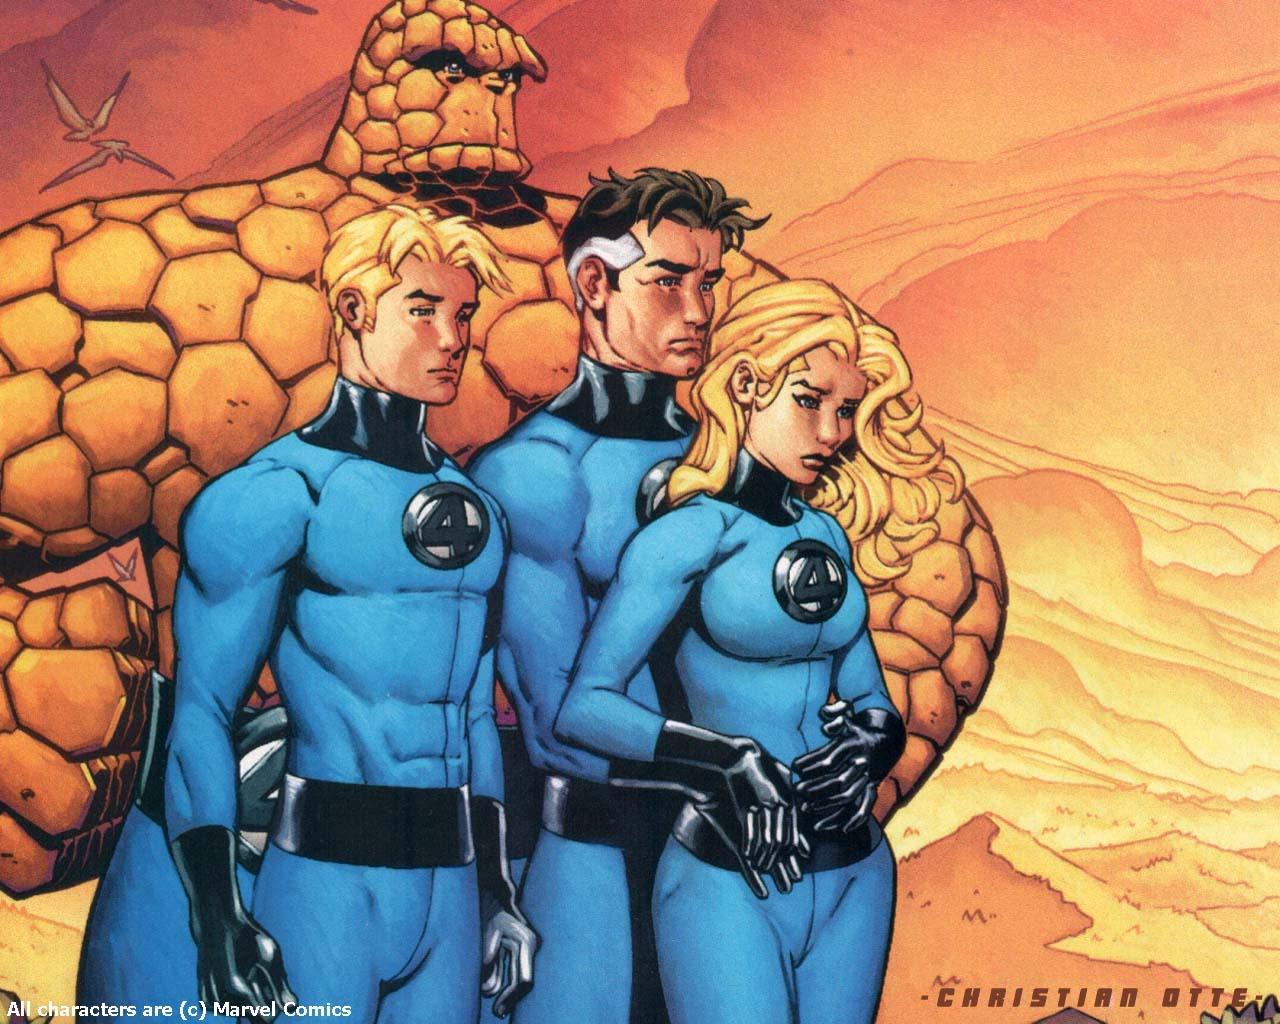 Fantastic 4 Cartoon Characters : Alternative origin story for doctor doom in new fantastic